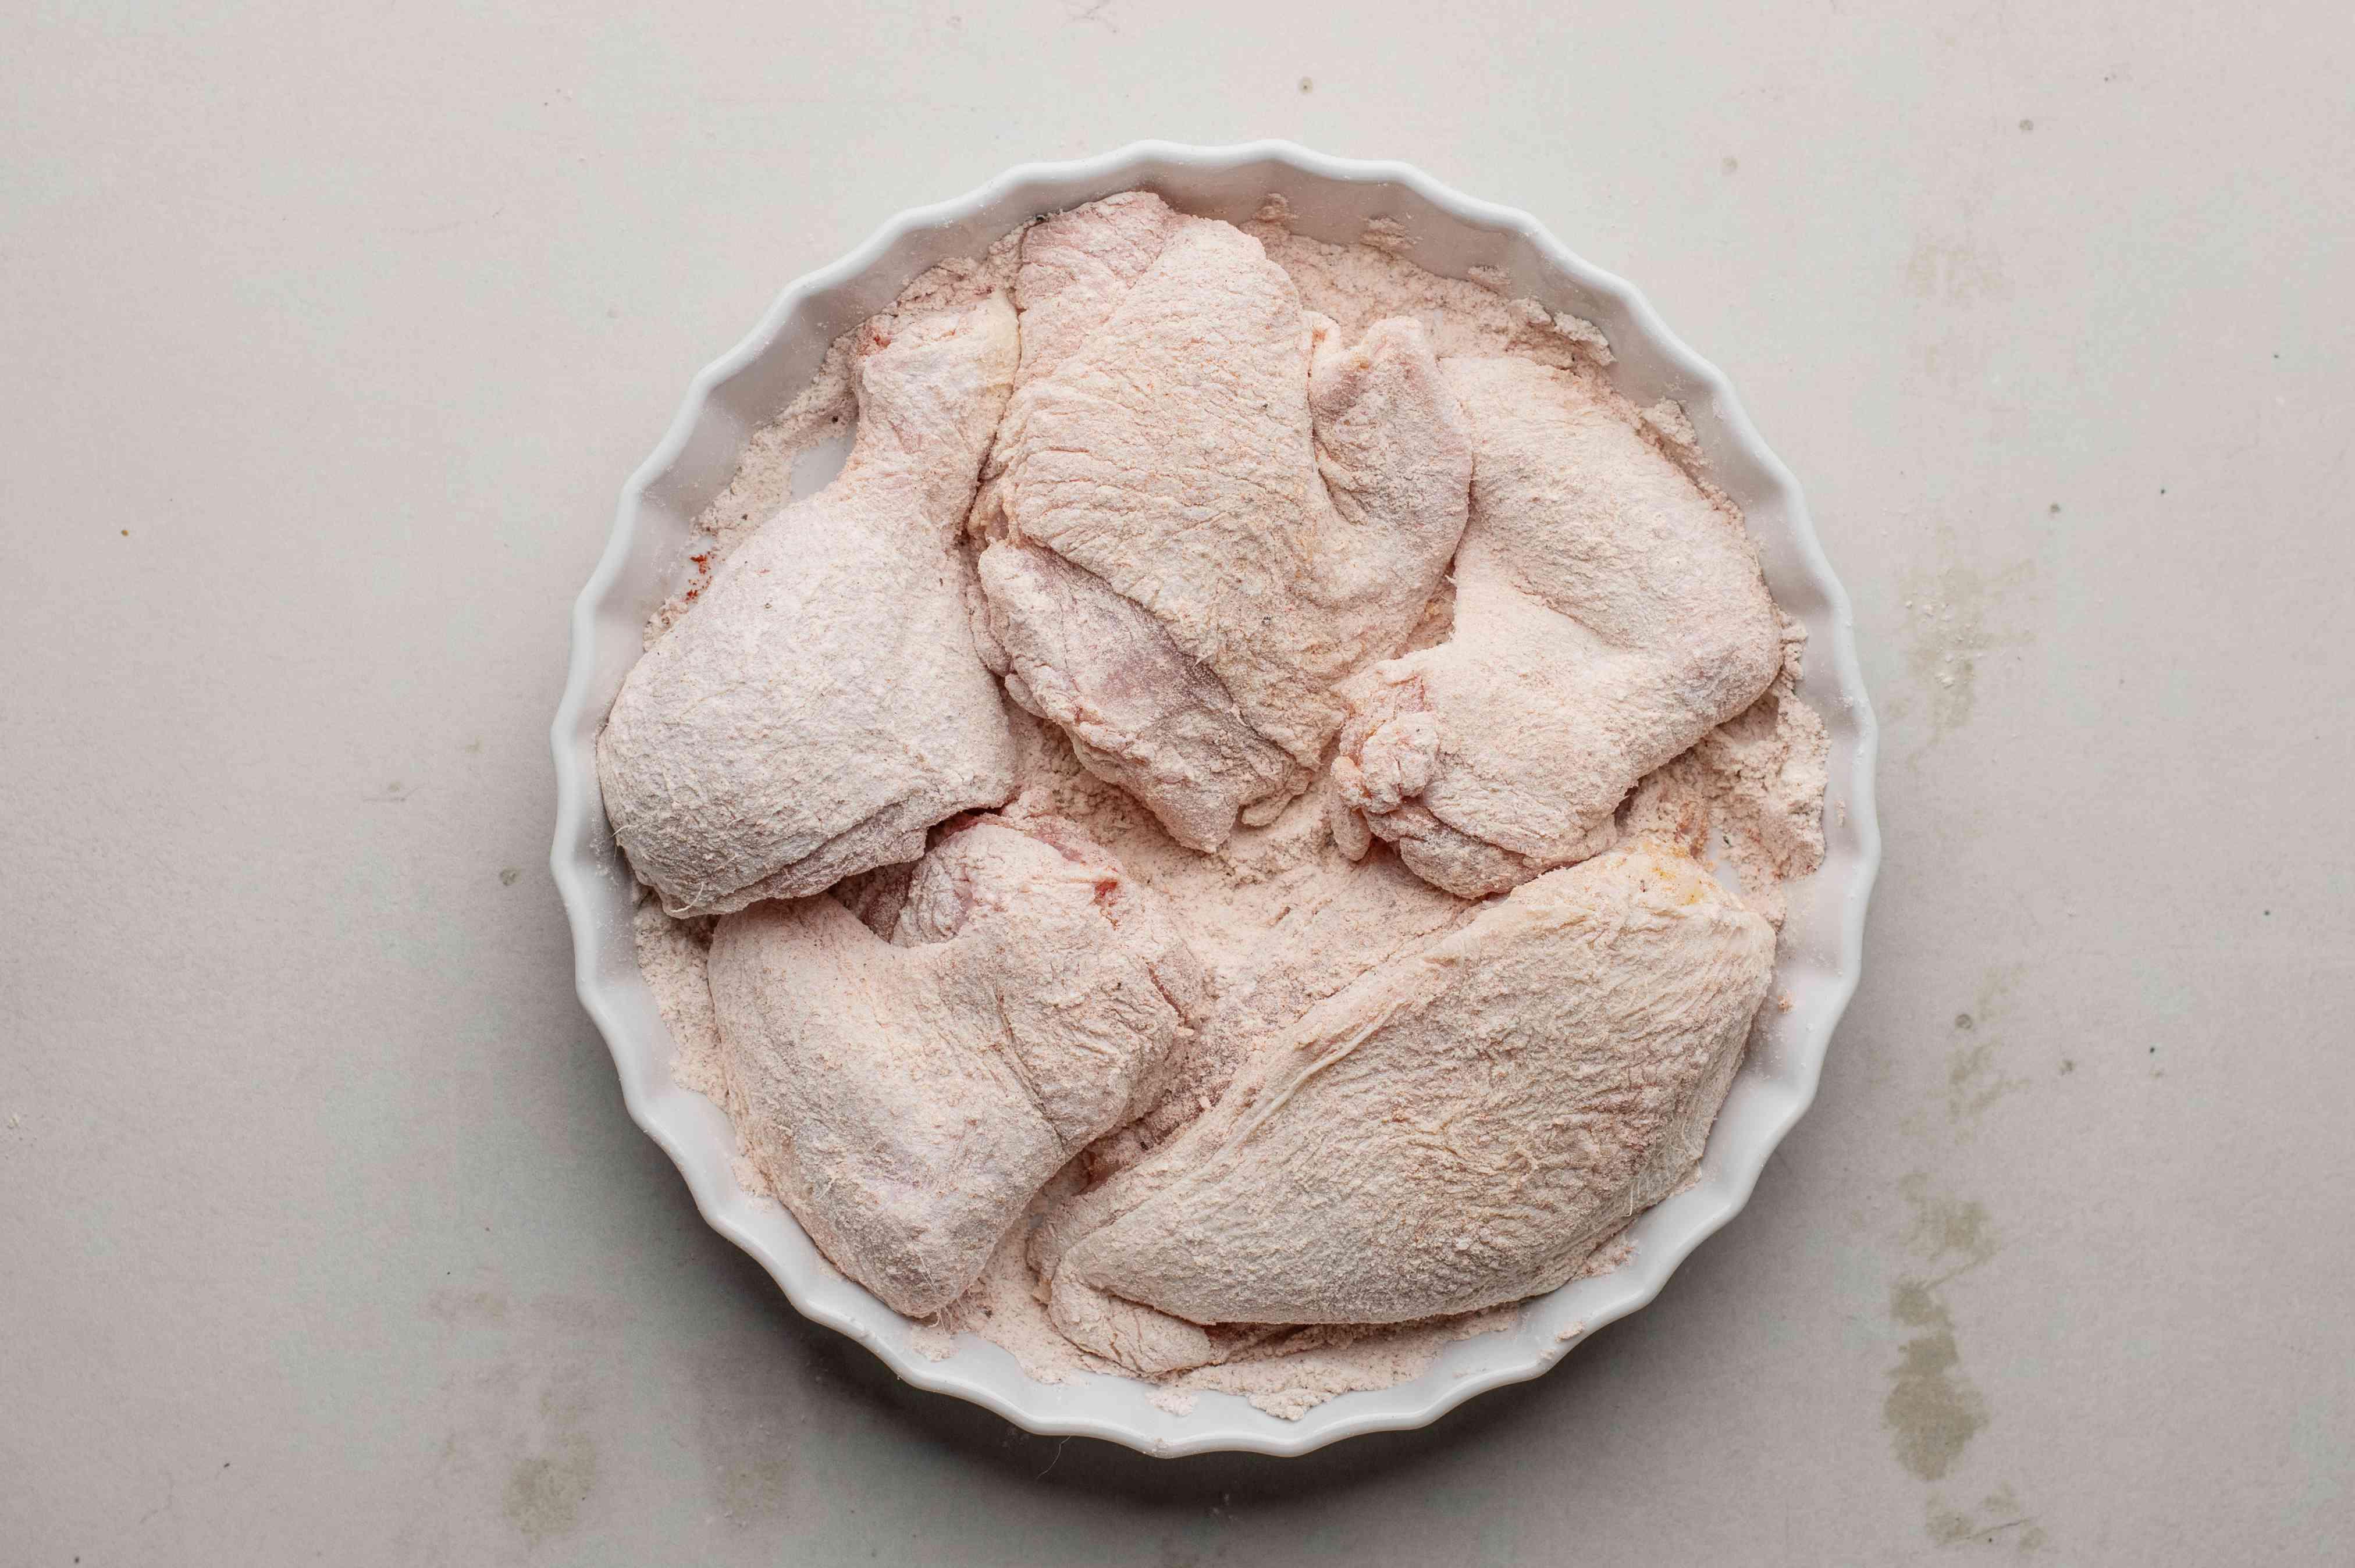 Coating chicken pieces in seasoned flour